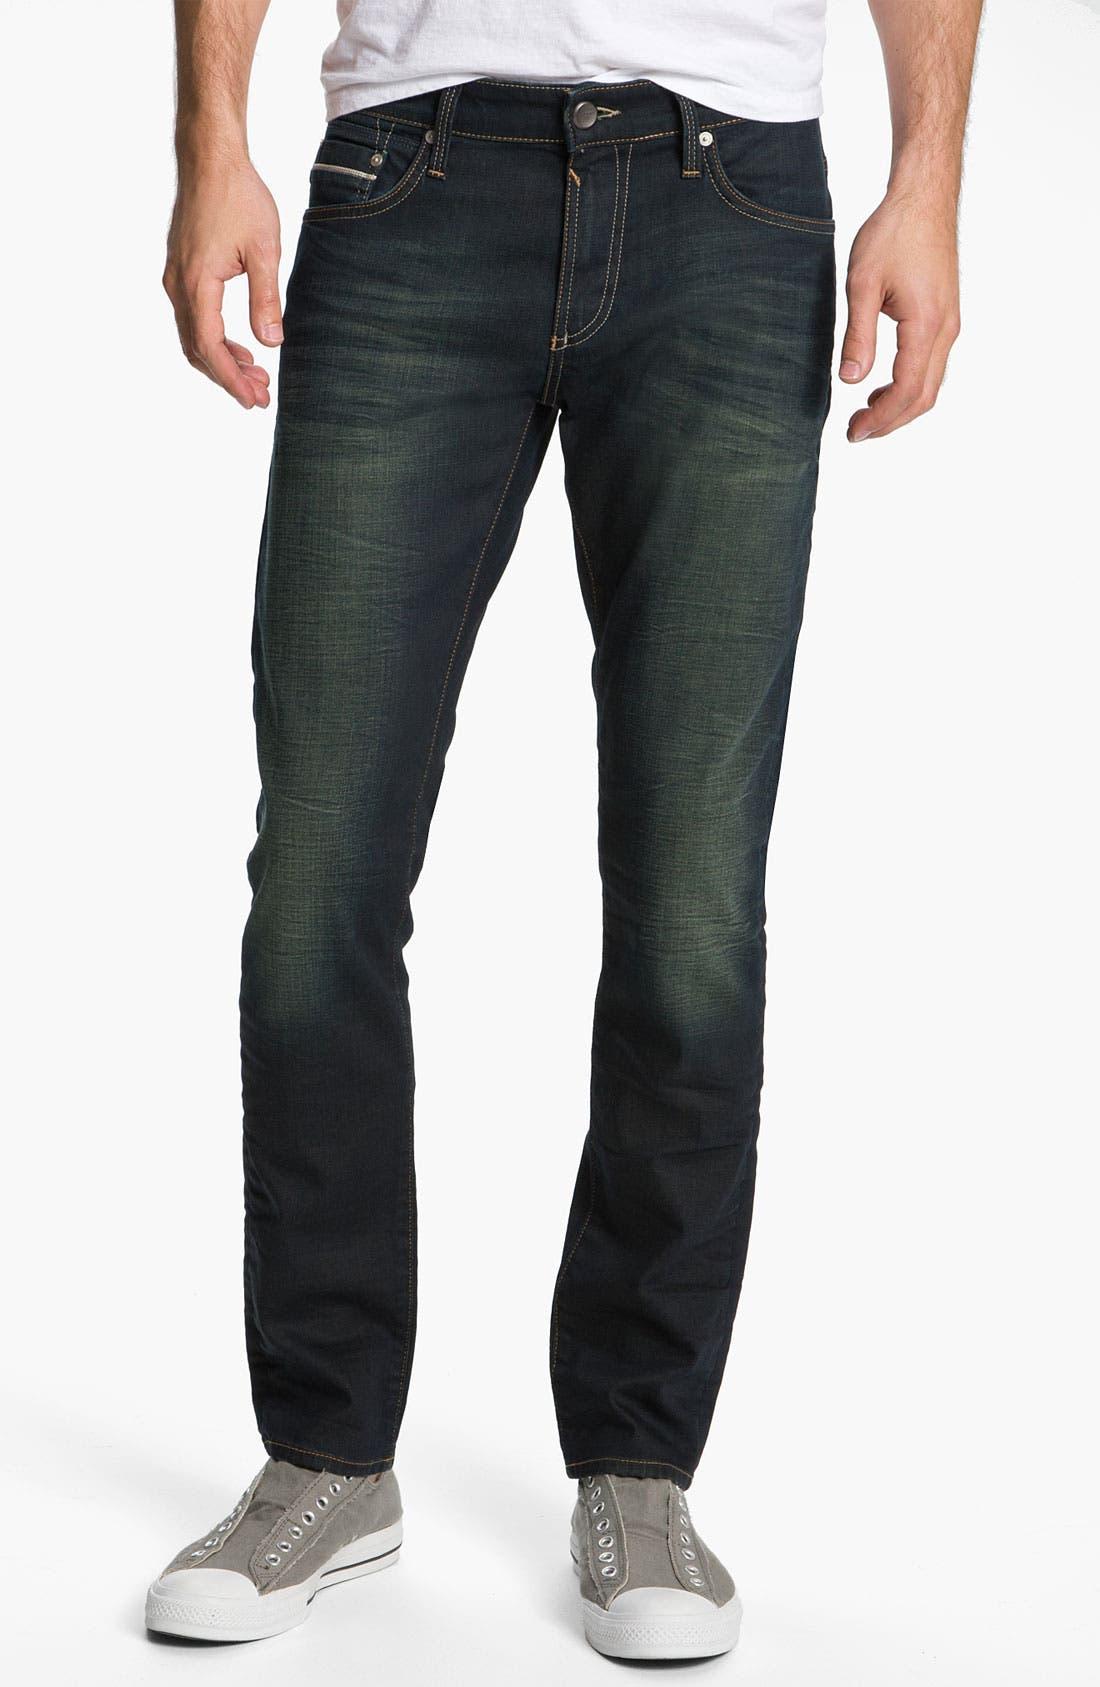 Alternate Image 1 Selected - Mavi Jeans 'Jake' Slim Fit Jeans (Smoke White Edge)